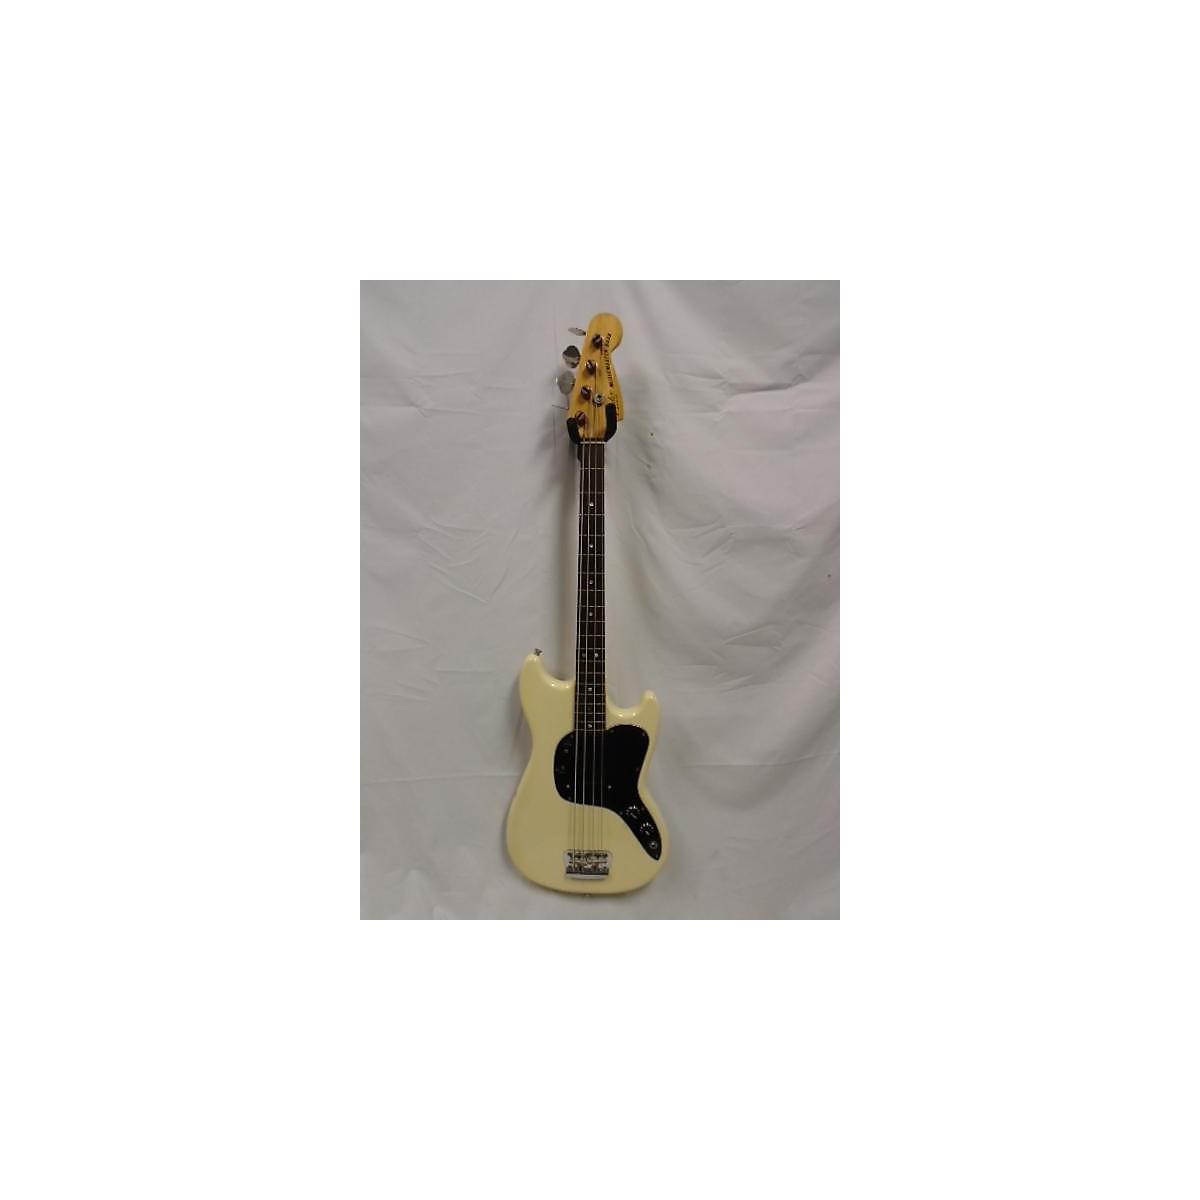 Fender 1978 Musicmaster Electric Bass Guitar